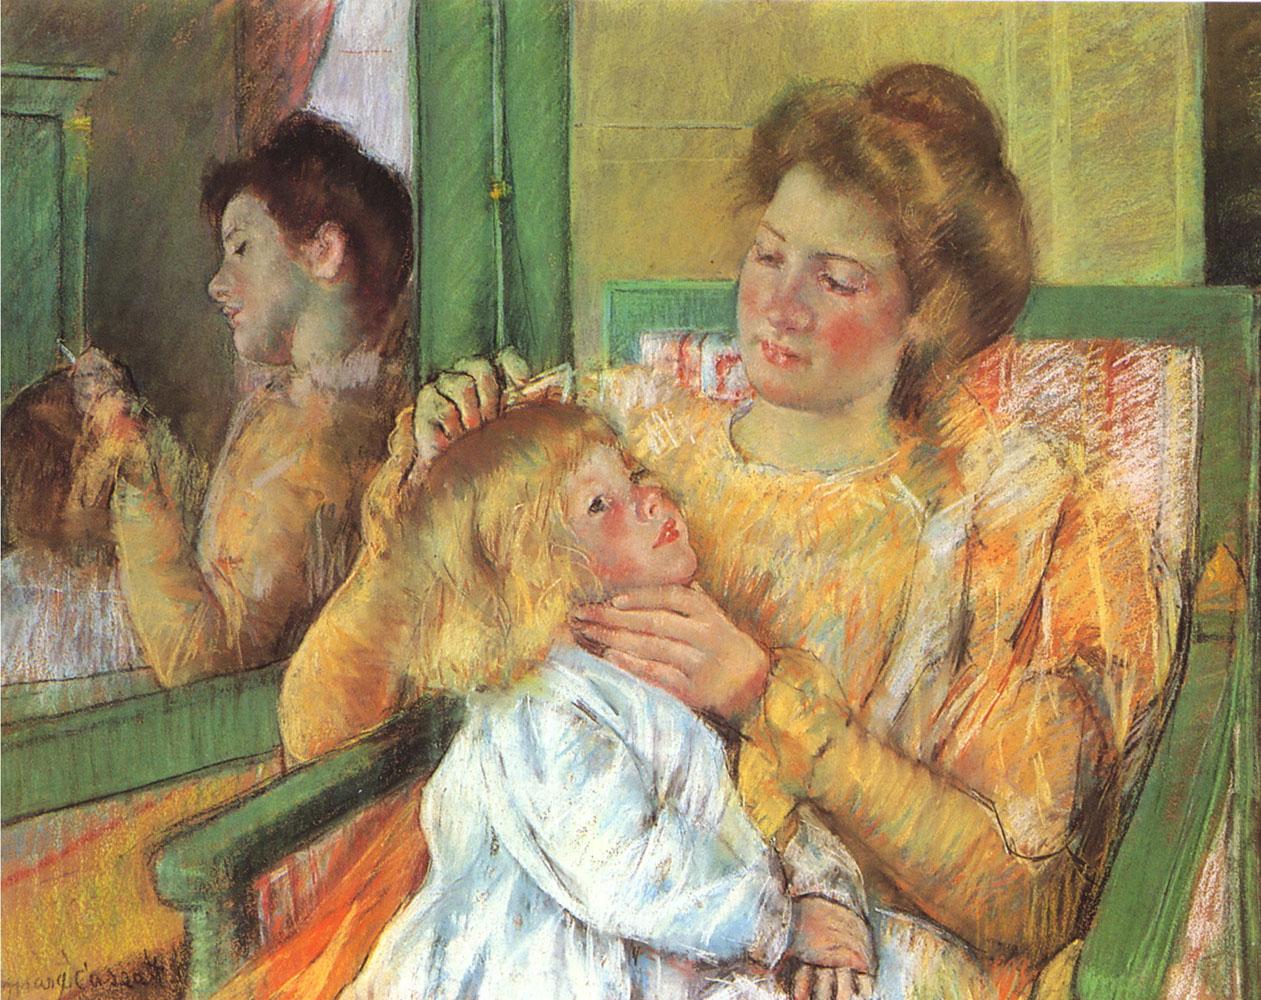 File:Cassatt Mary Mother Combing Child's Hair 1879.jpg - Wikimedia ...